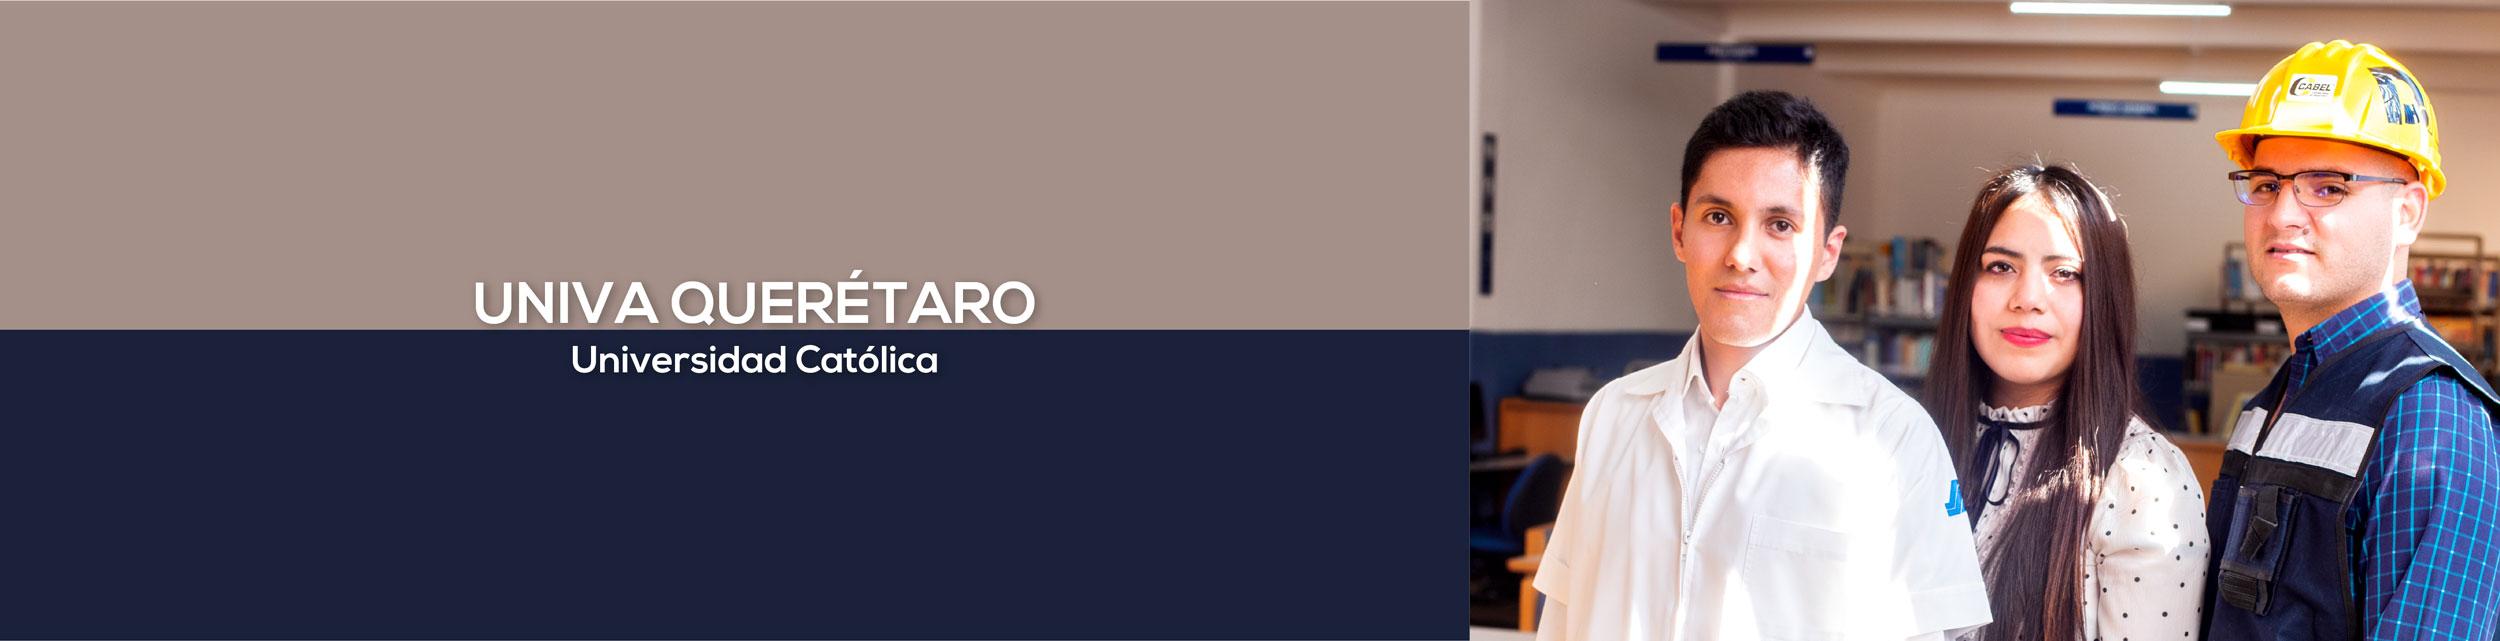 banner-arriba-01